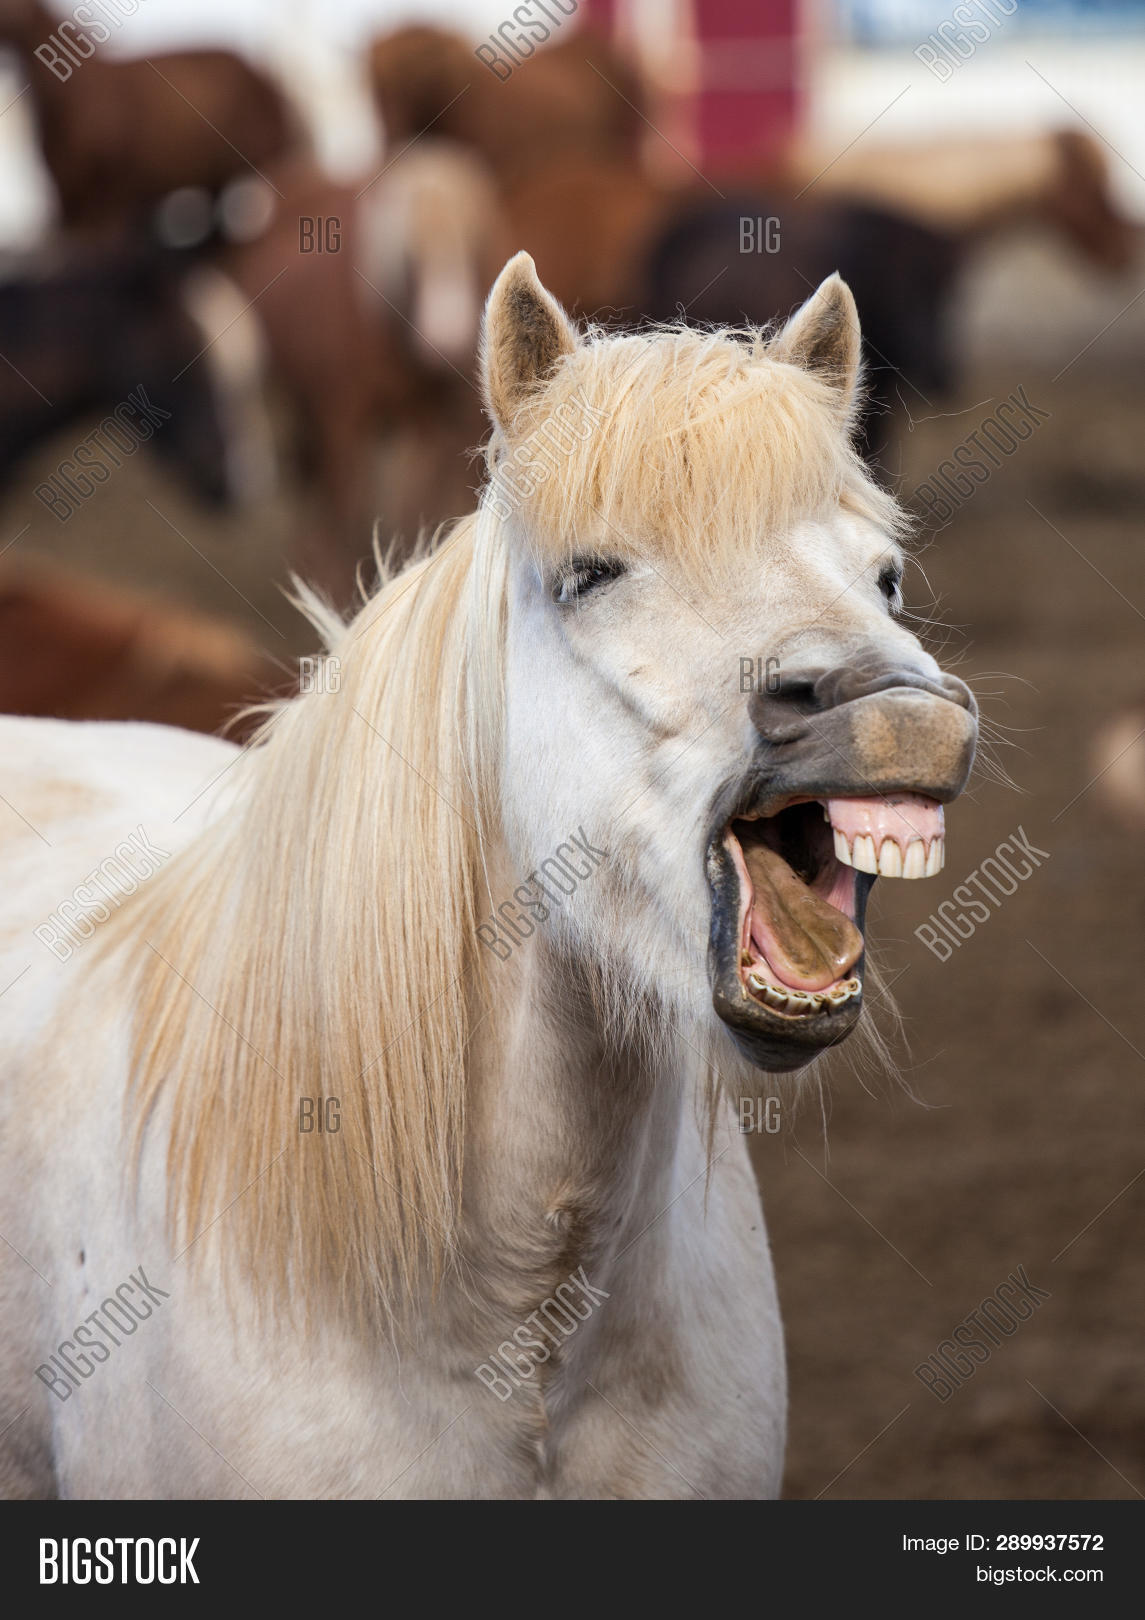 Funny Icelandic Horse Image Photo Free Trial Bigstock